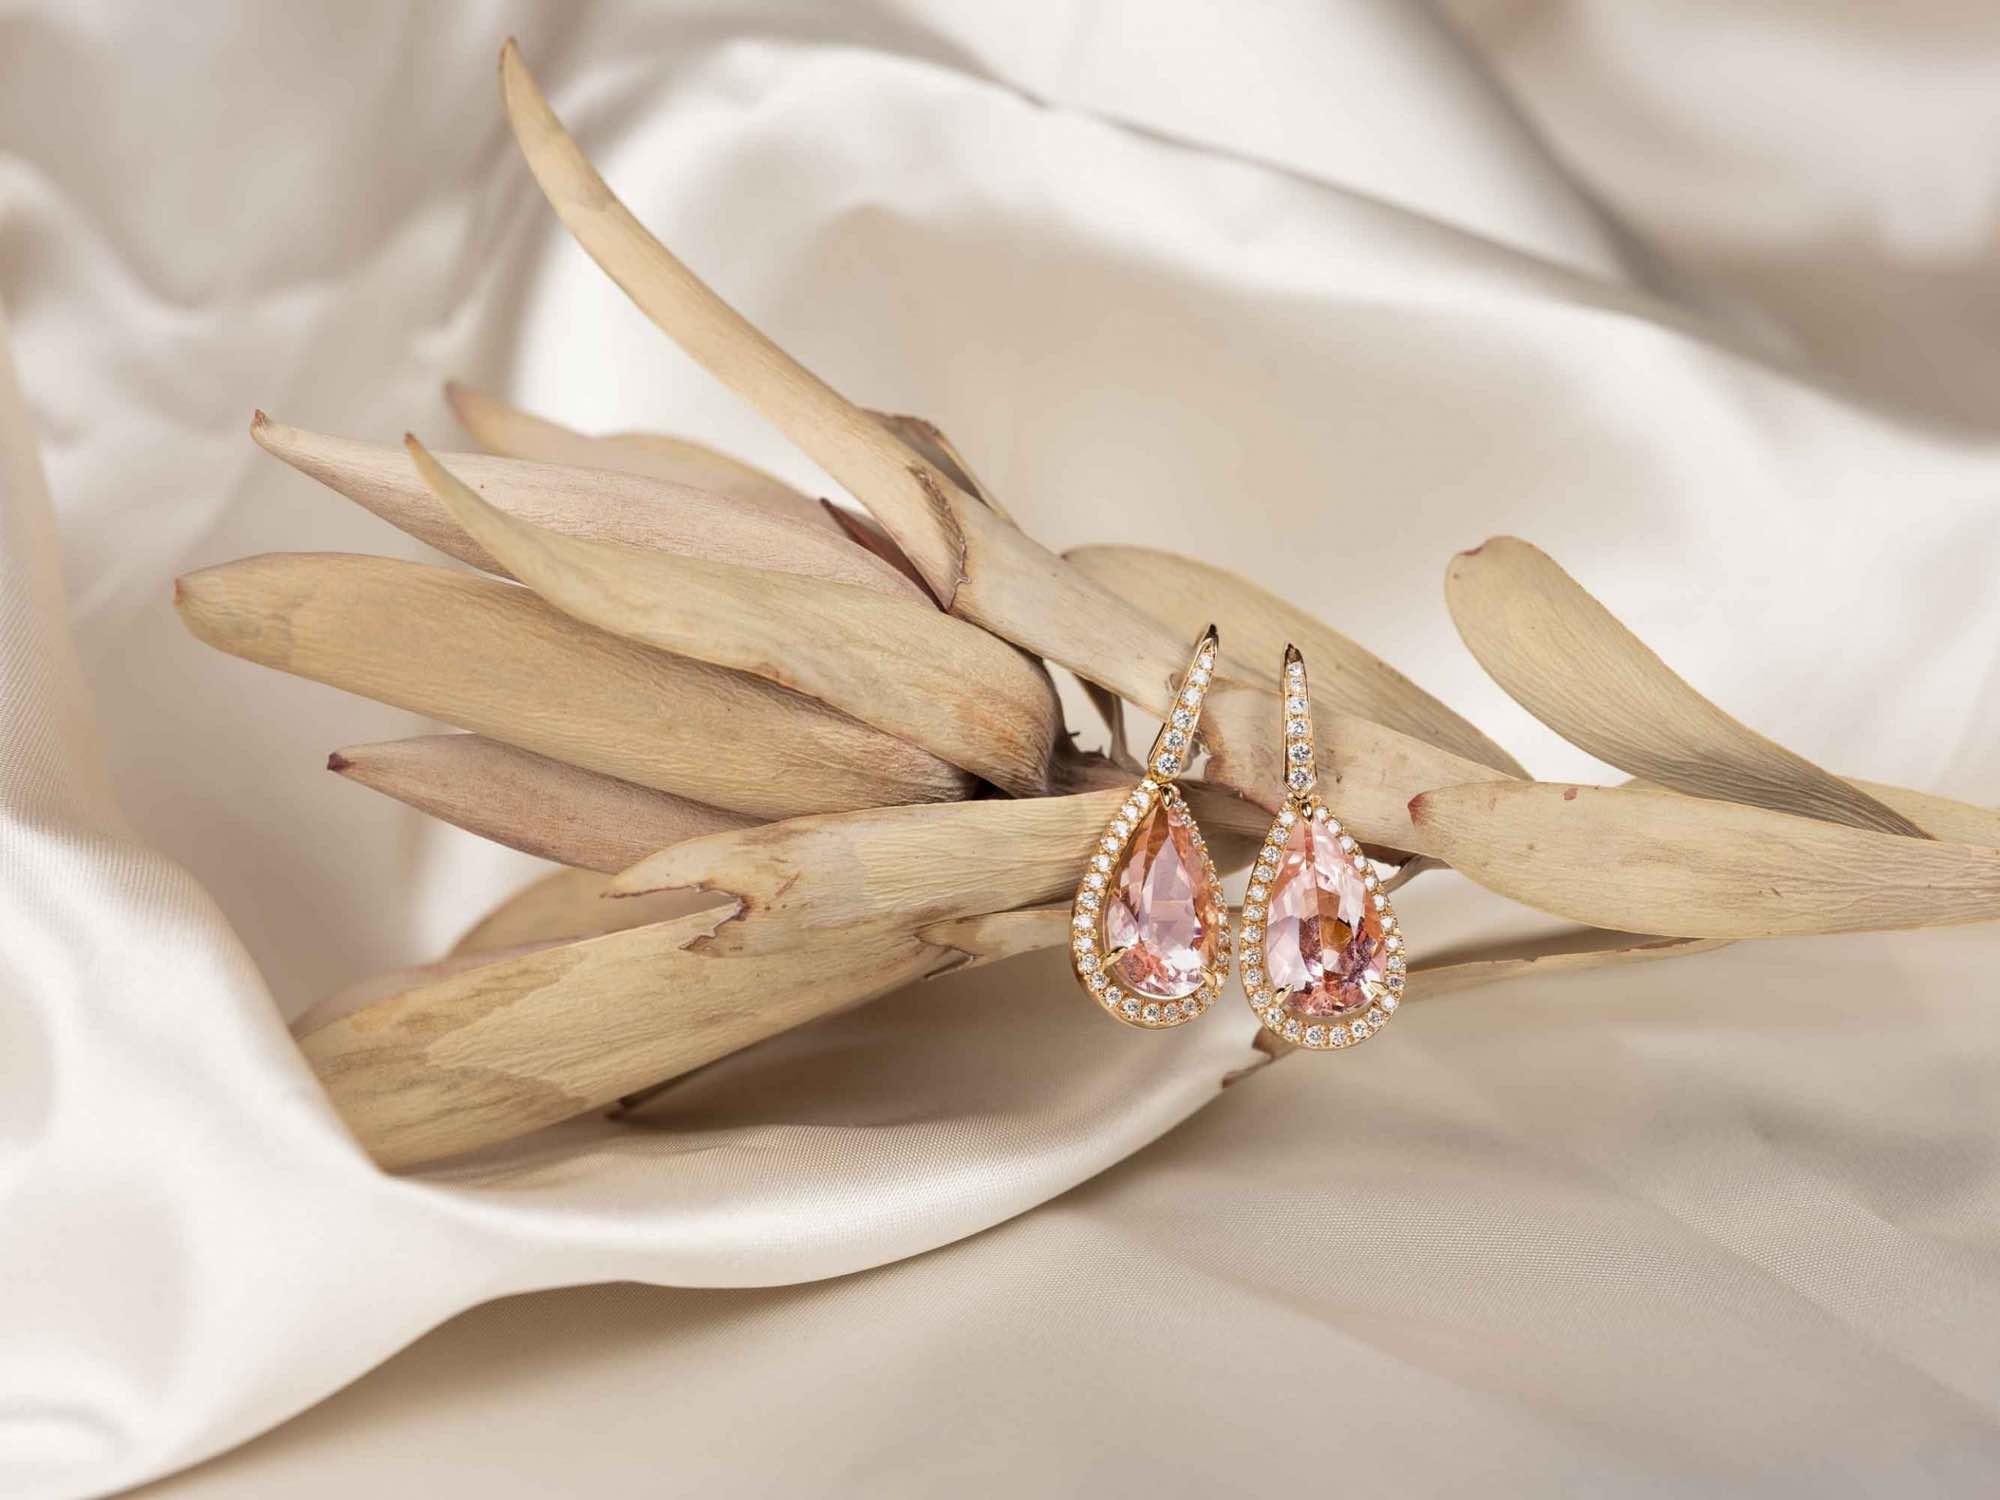 Jewellery Product Photography Singapore Jose Jeuland 1